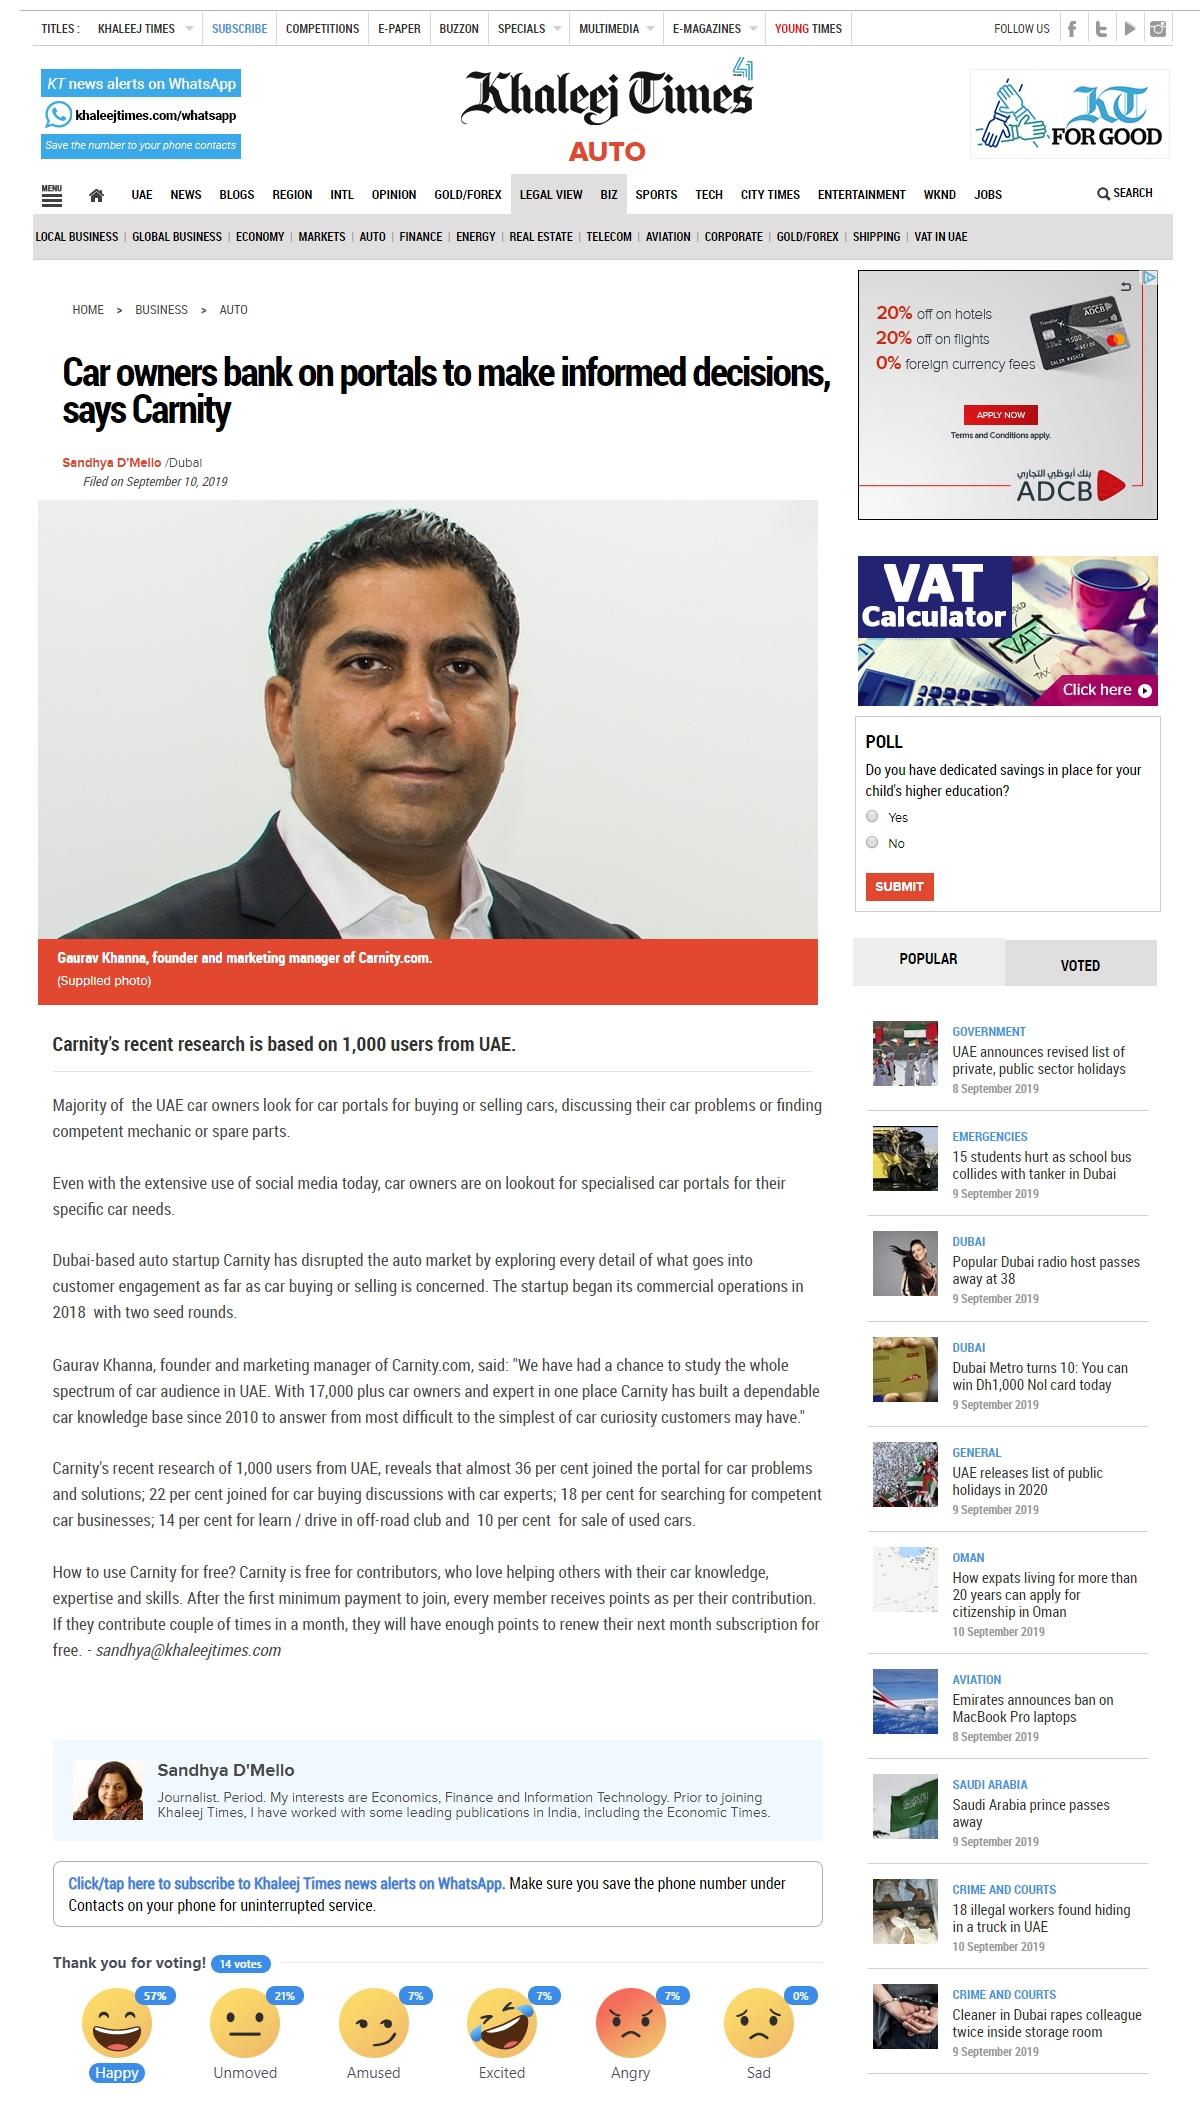 Khaleej Times - Carnity Article.jpg